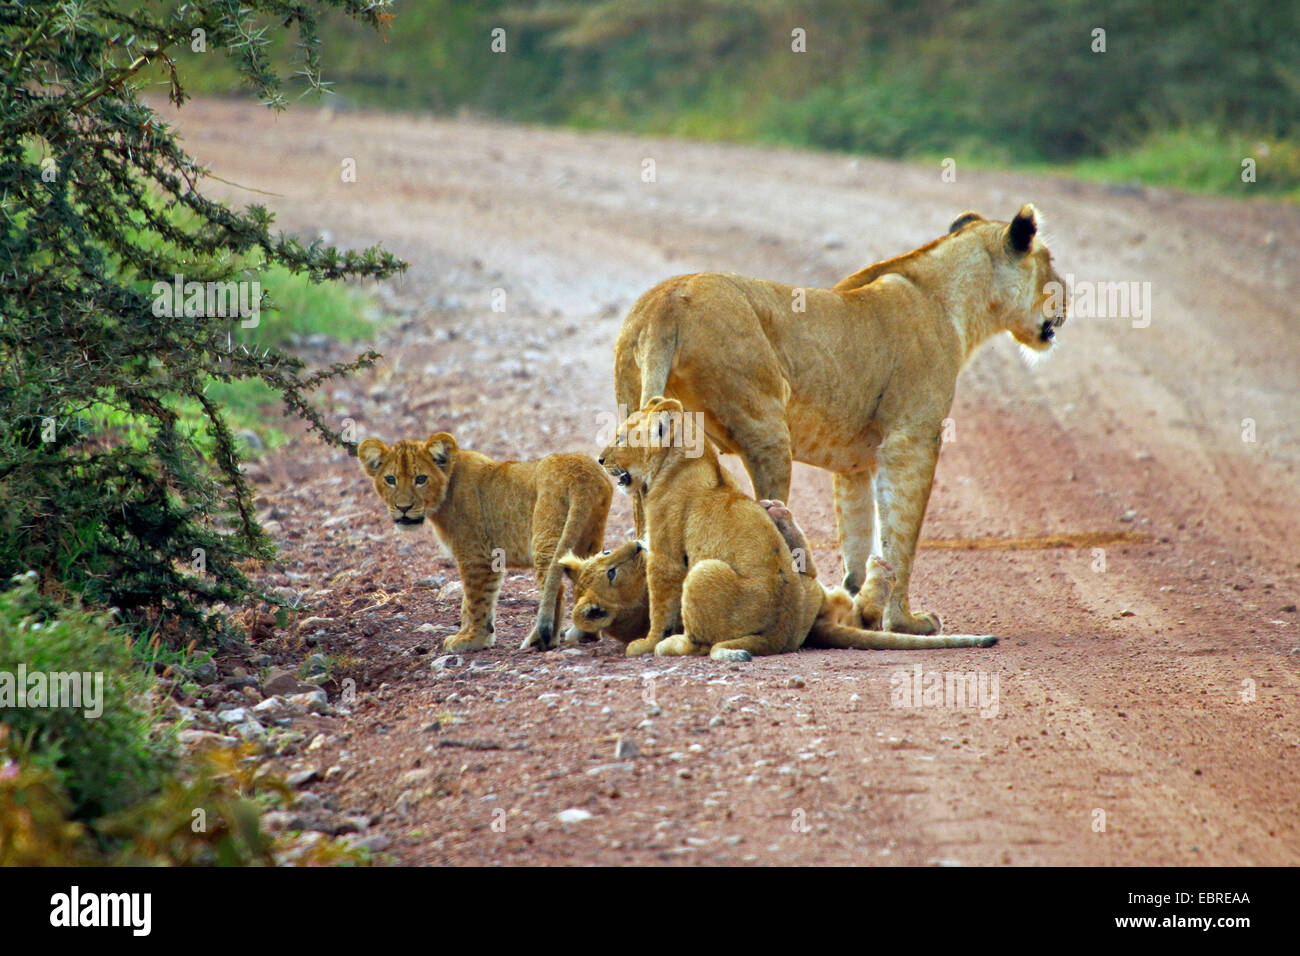 lion (Panthera leo), lioness with three infants on a street, Tanzania, Serengeti National Park - Stock Image